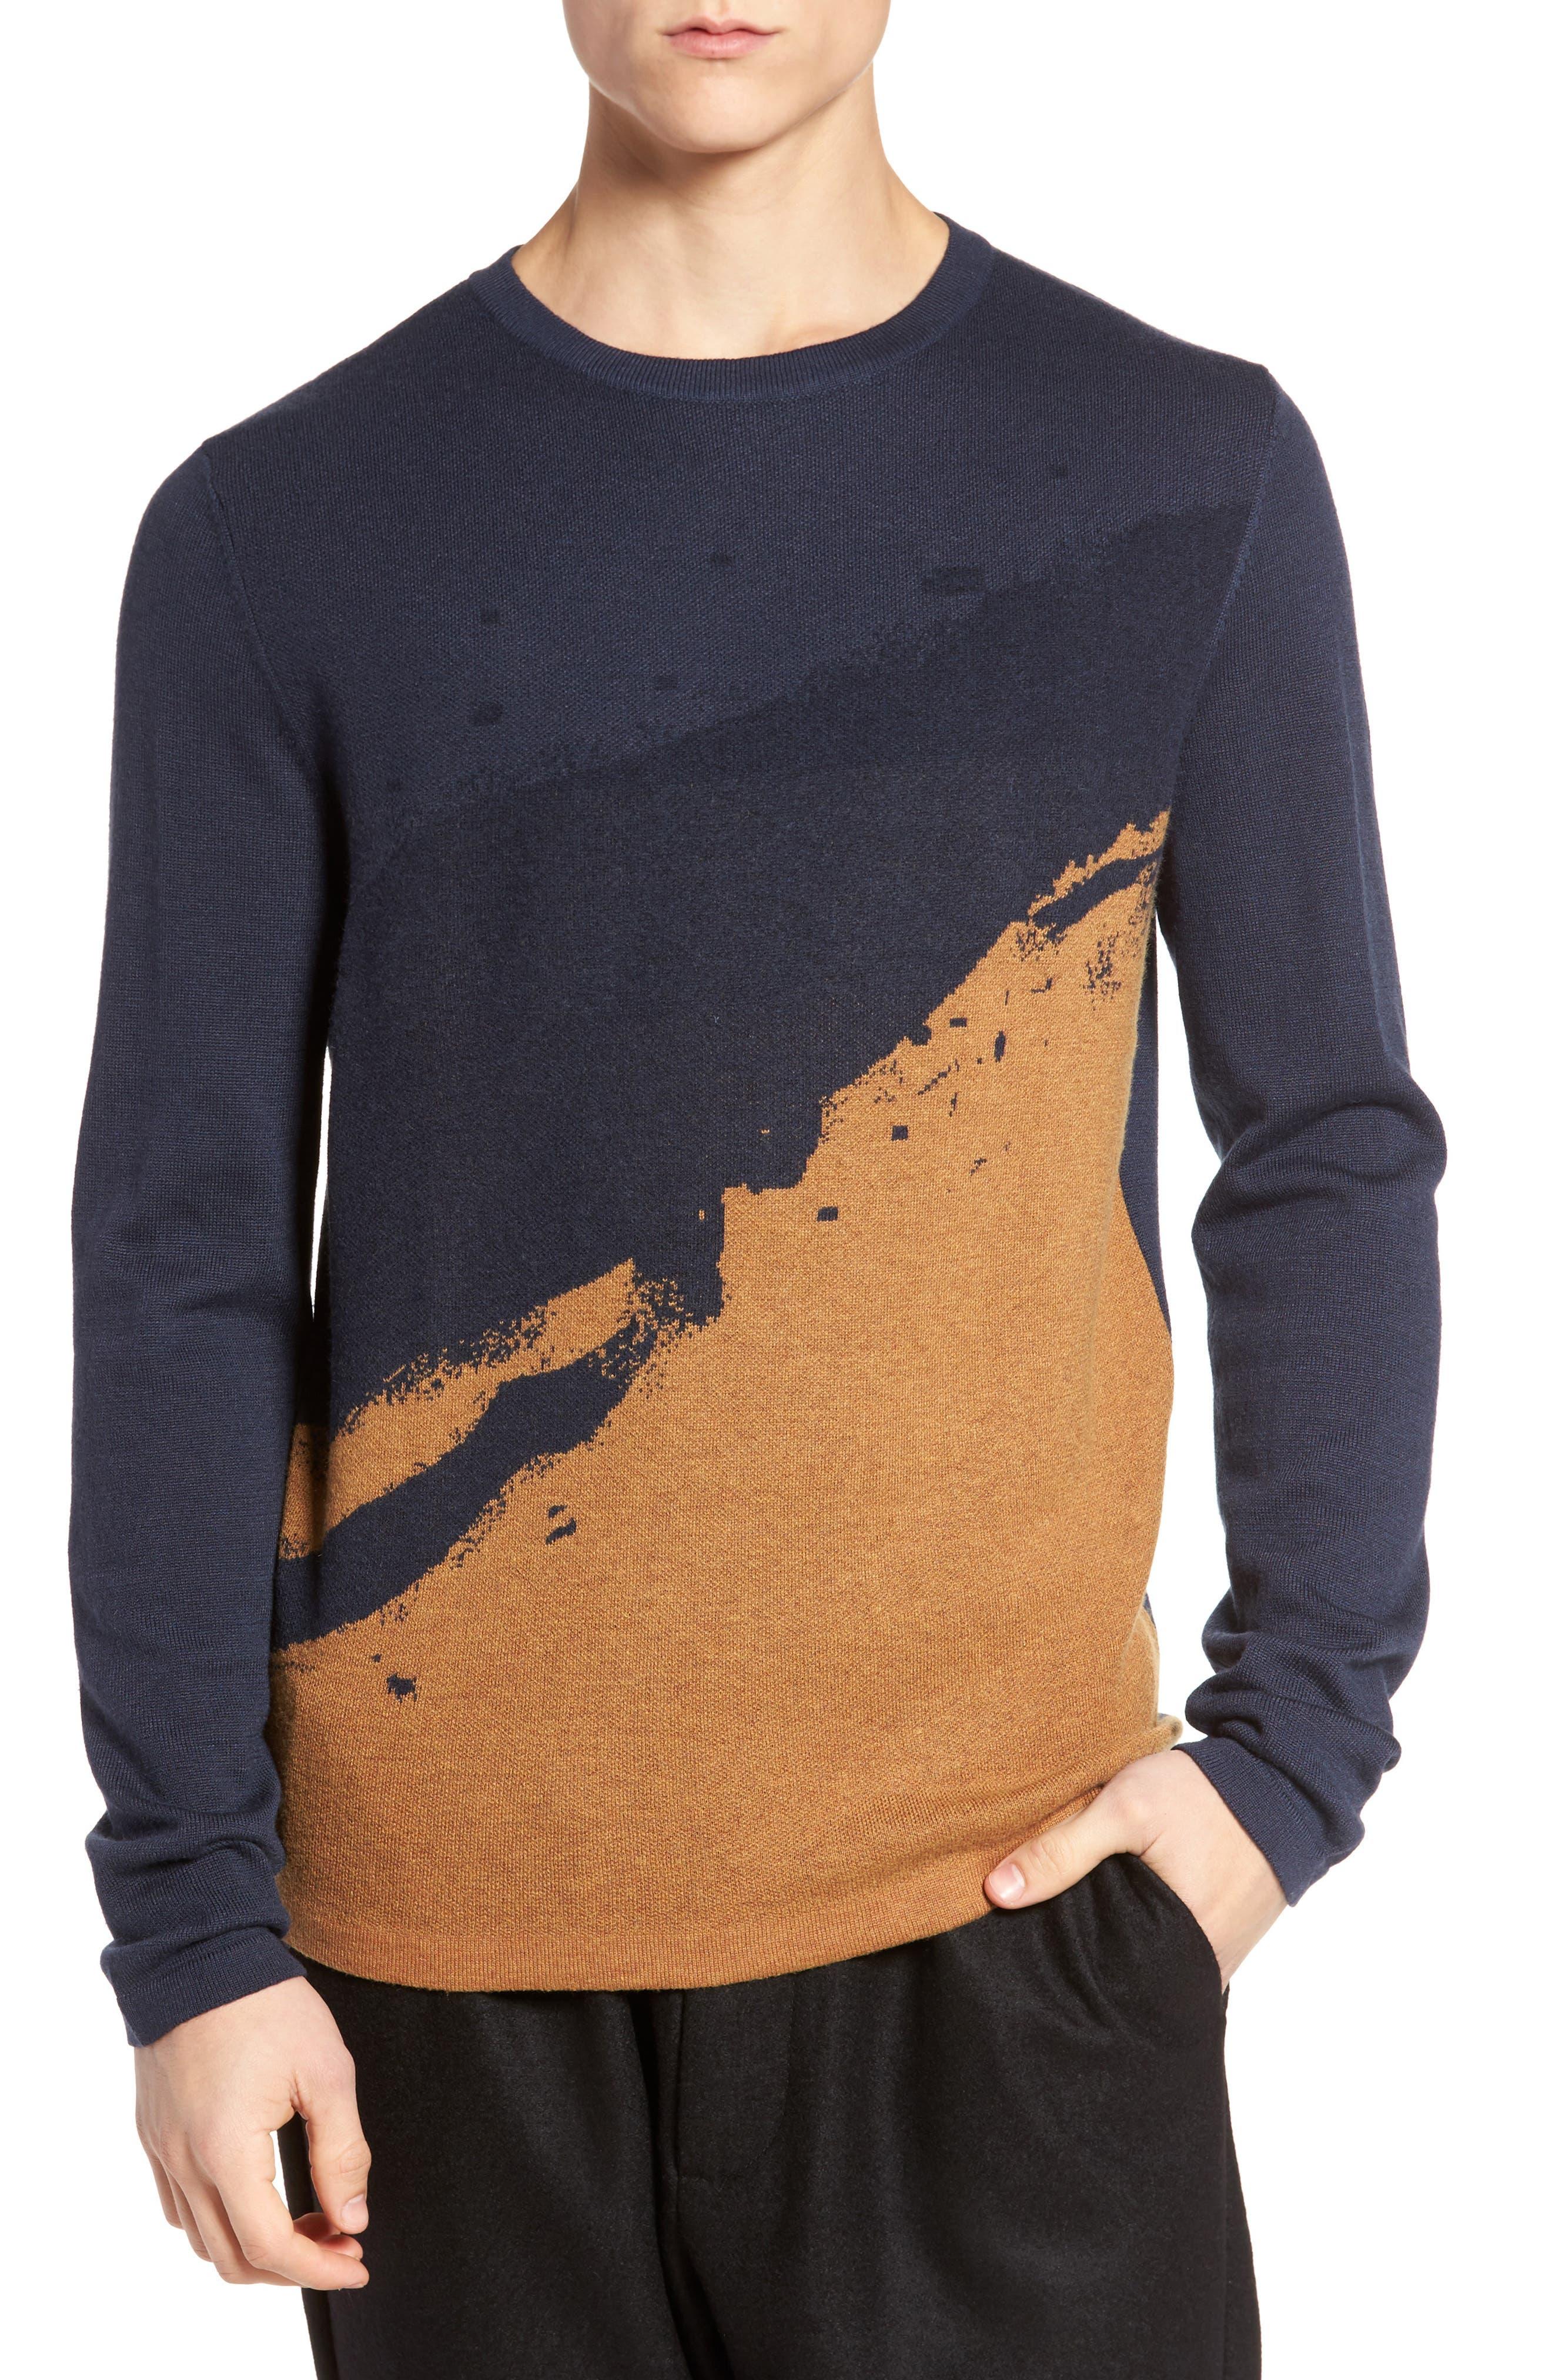 Anotny Morato Pattern Sweater,                             Main thumbnail 1, color,                             451